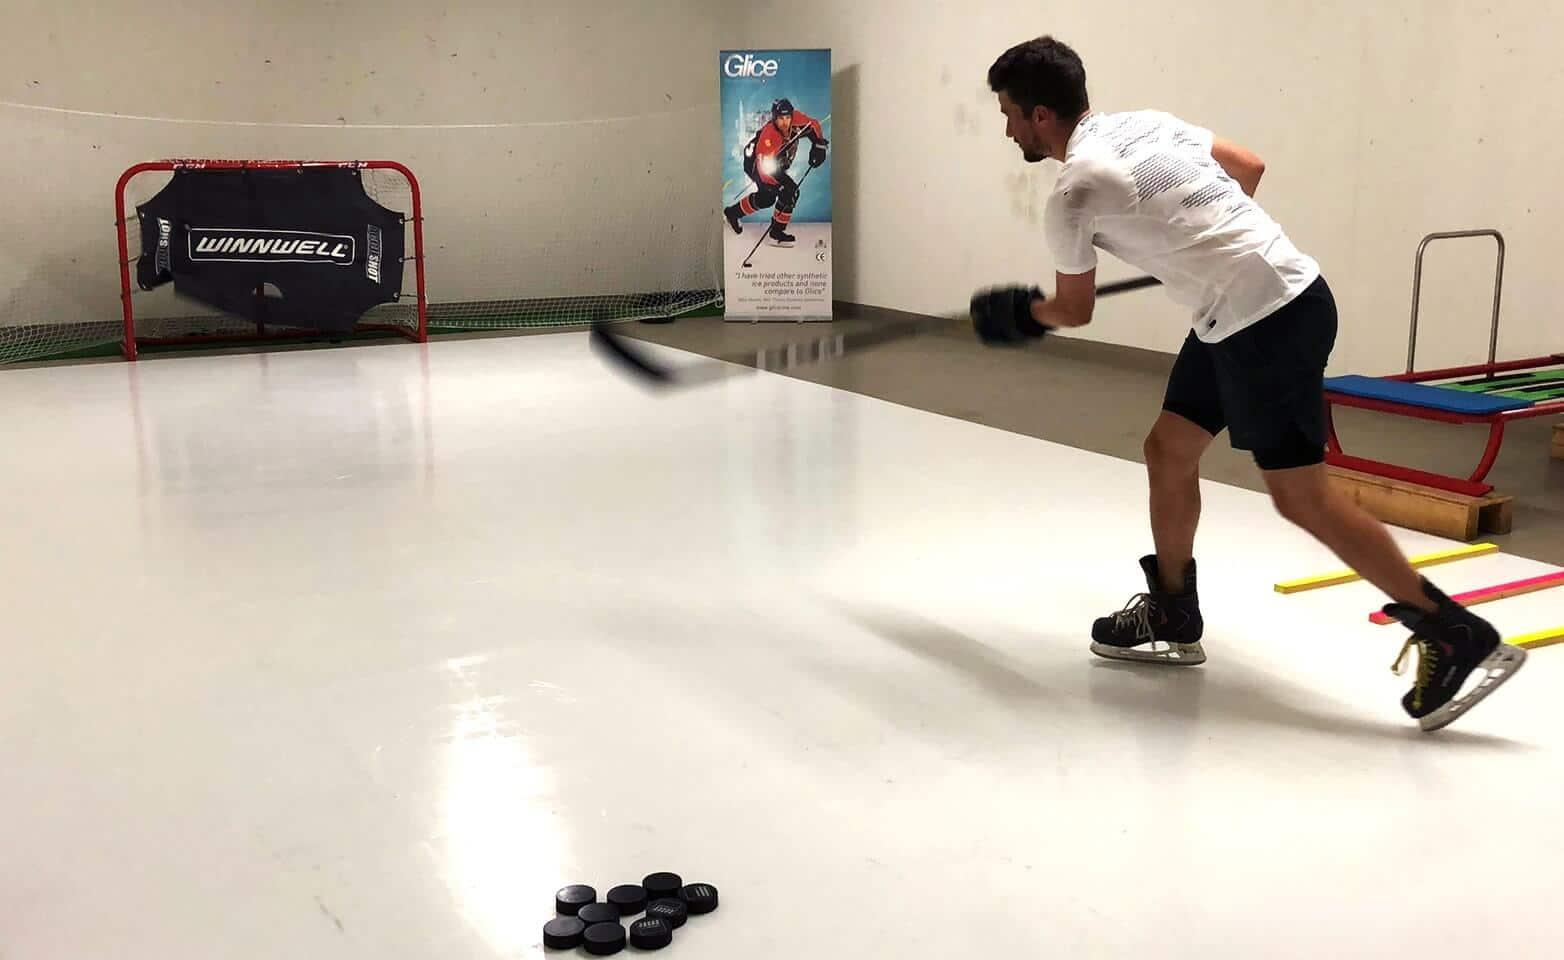 NHL-Star-Roman-Josi-practicing-on-synthetic-ice-pad